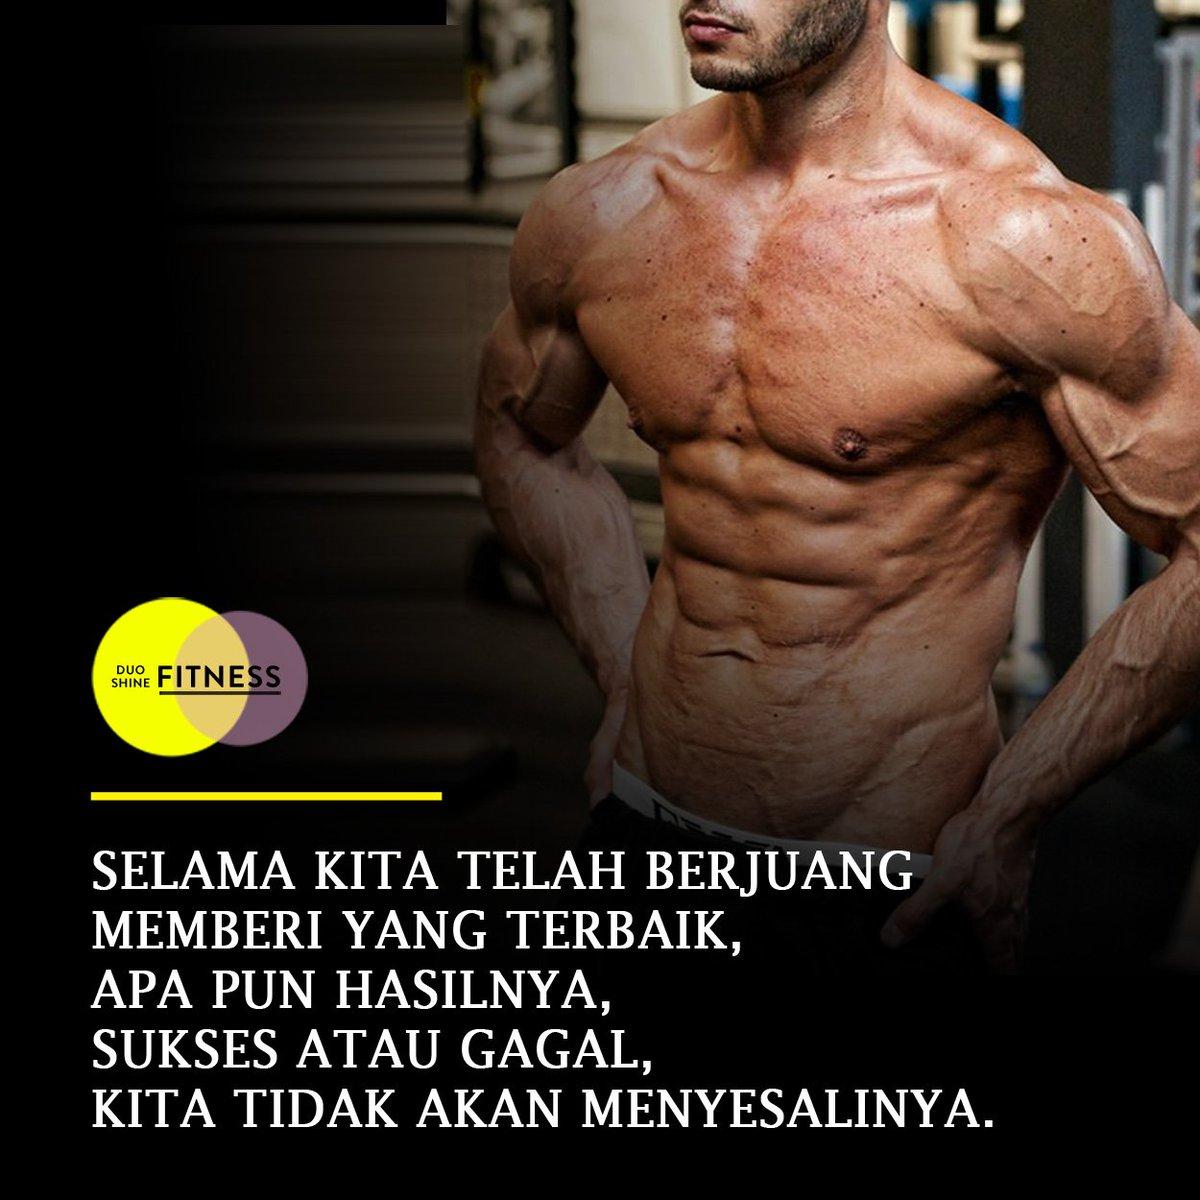 Kata Motivasi Fitness Bahasa Indonesia Cikimm Com